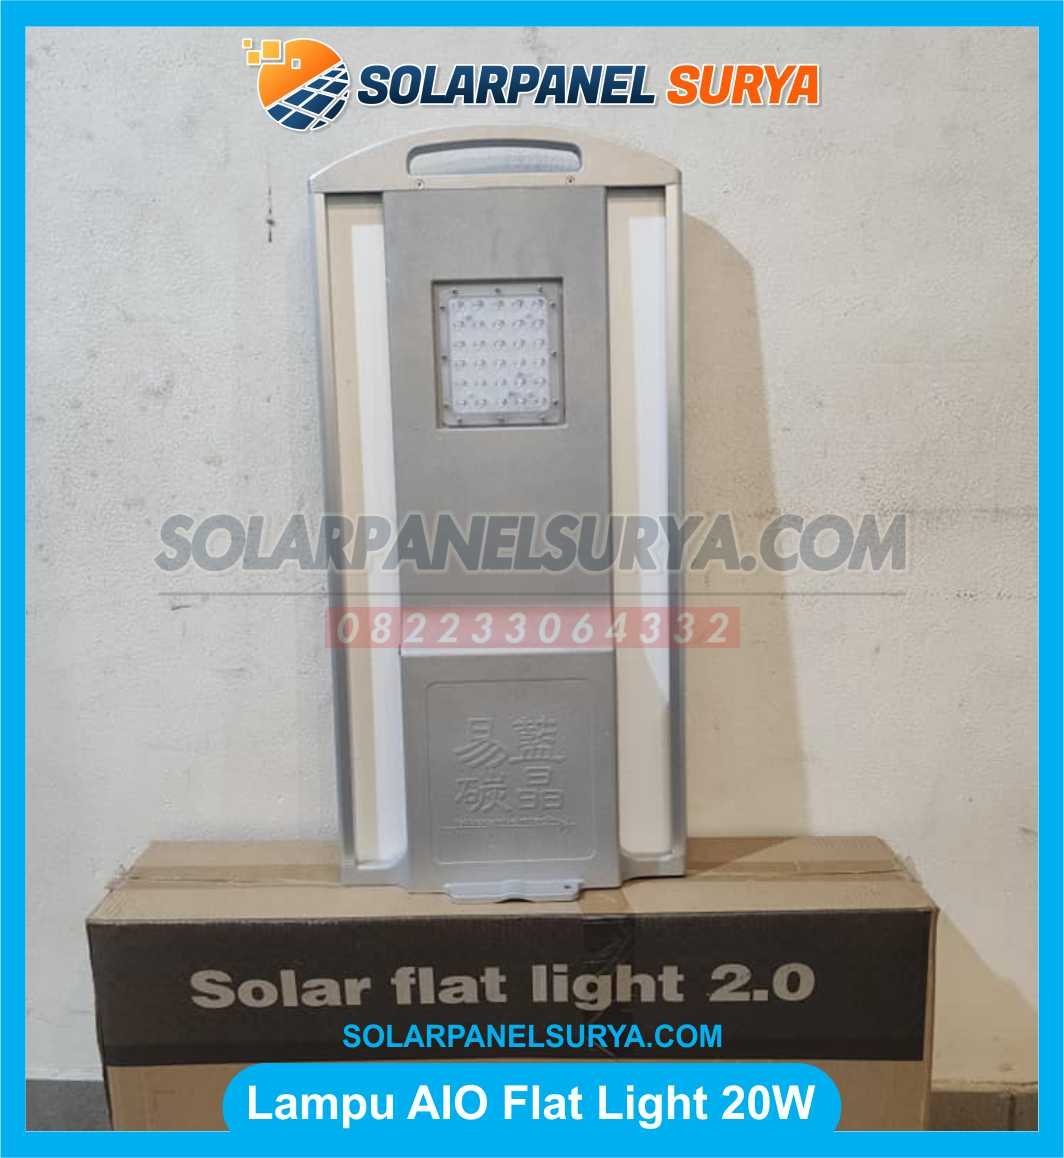 lampu solar cell all in one 20 watt flat light